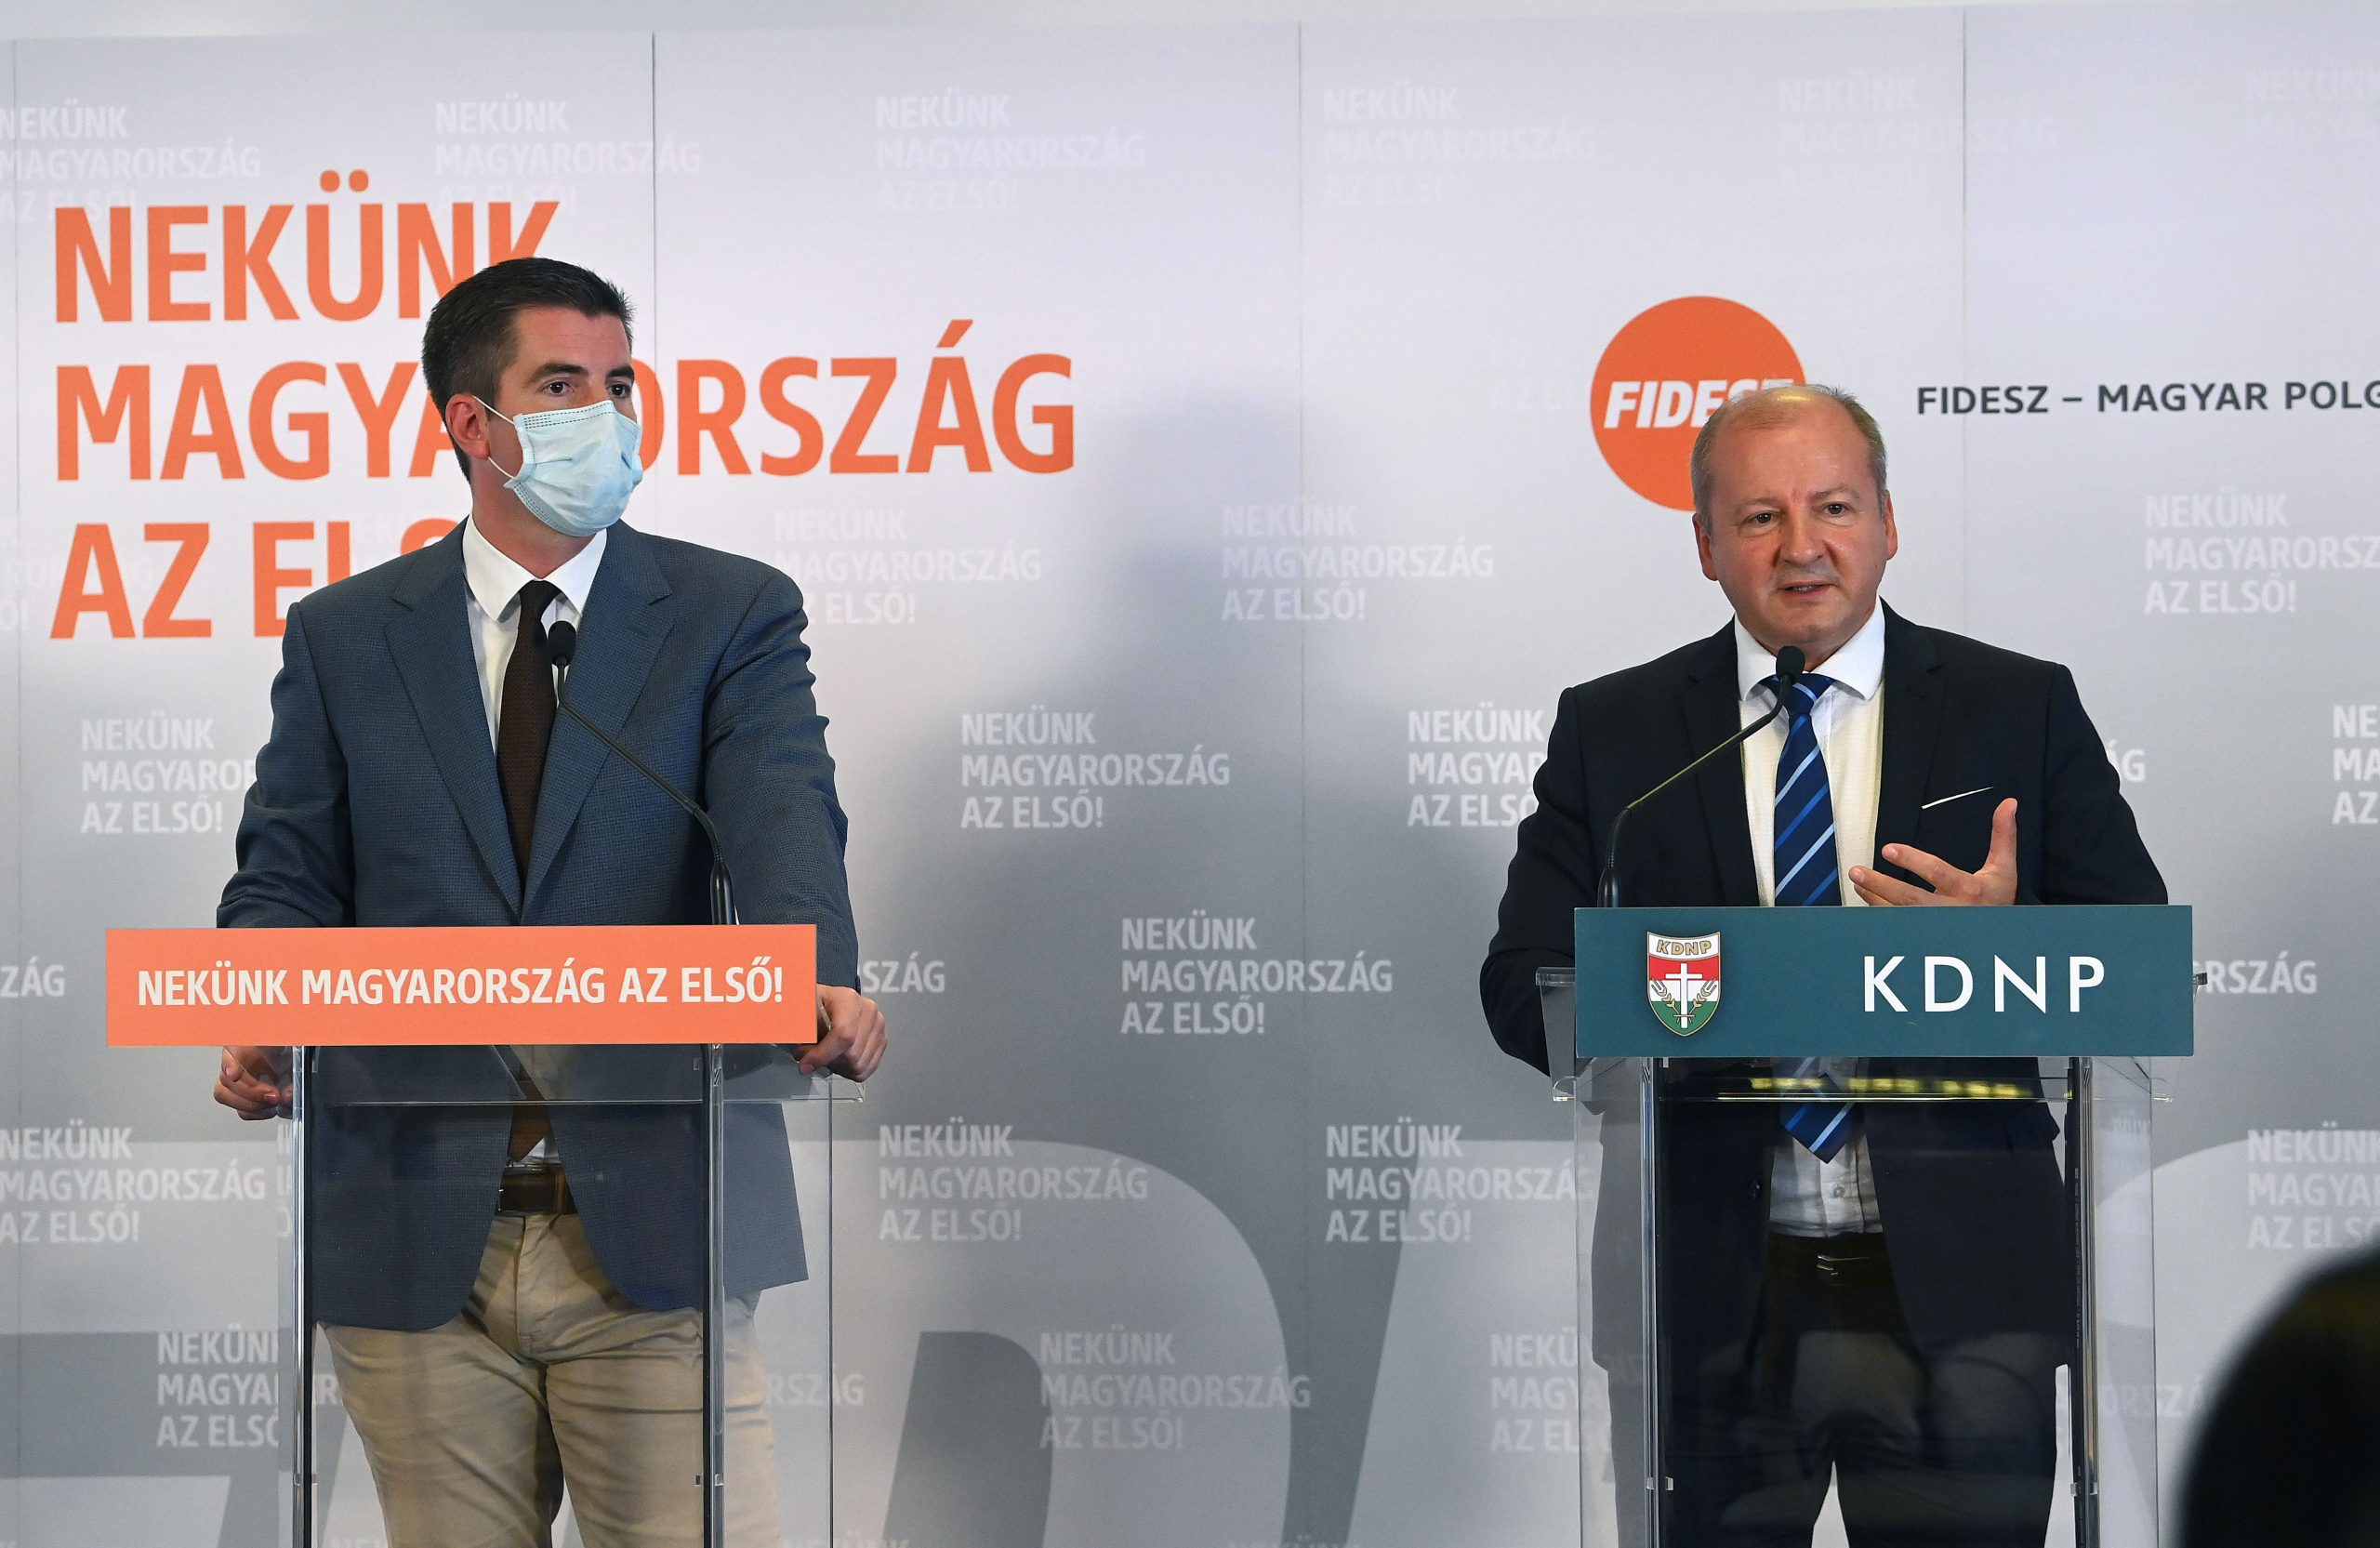 Coronavirus – Fidesz: Hungary Must Function Despite Pandemic post's picture